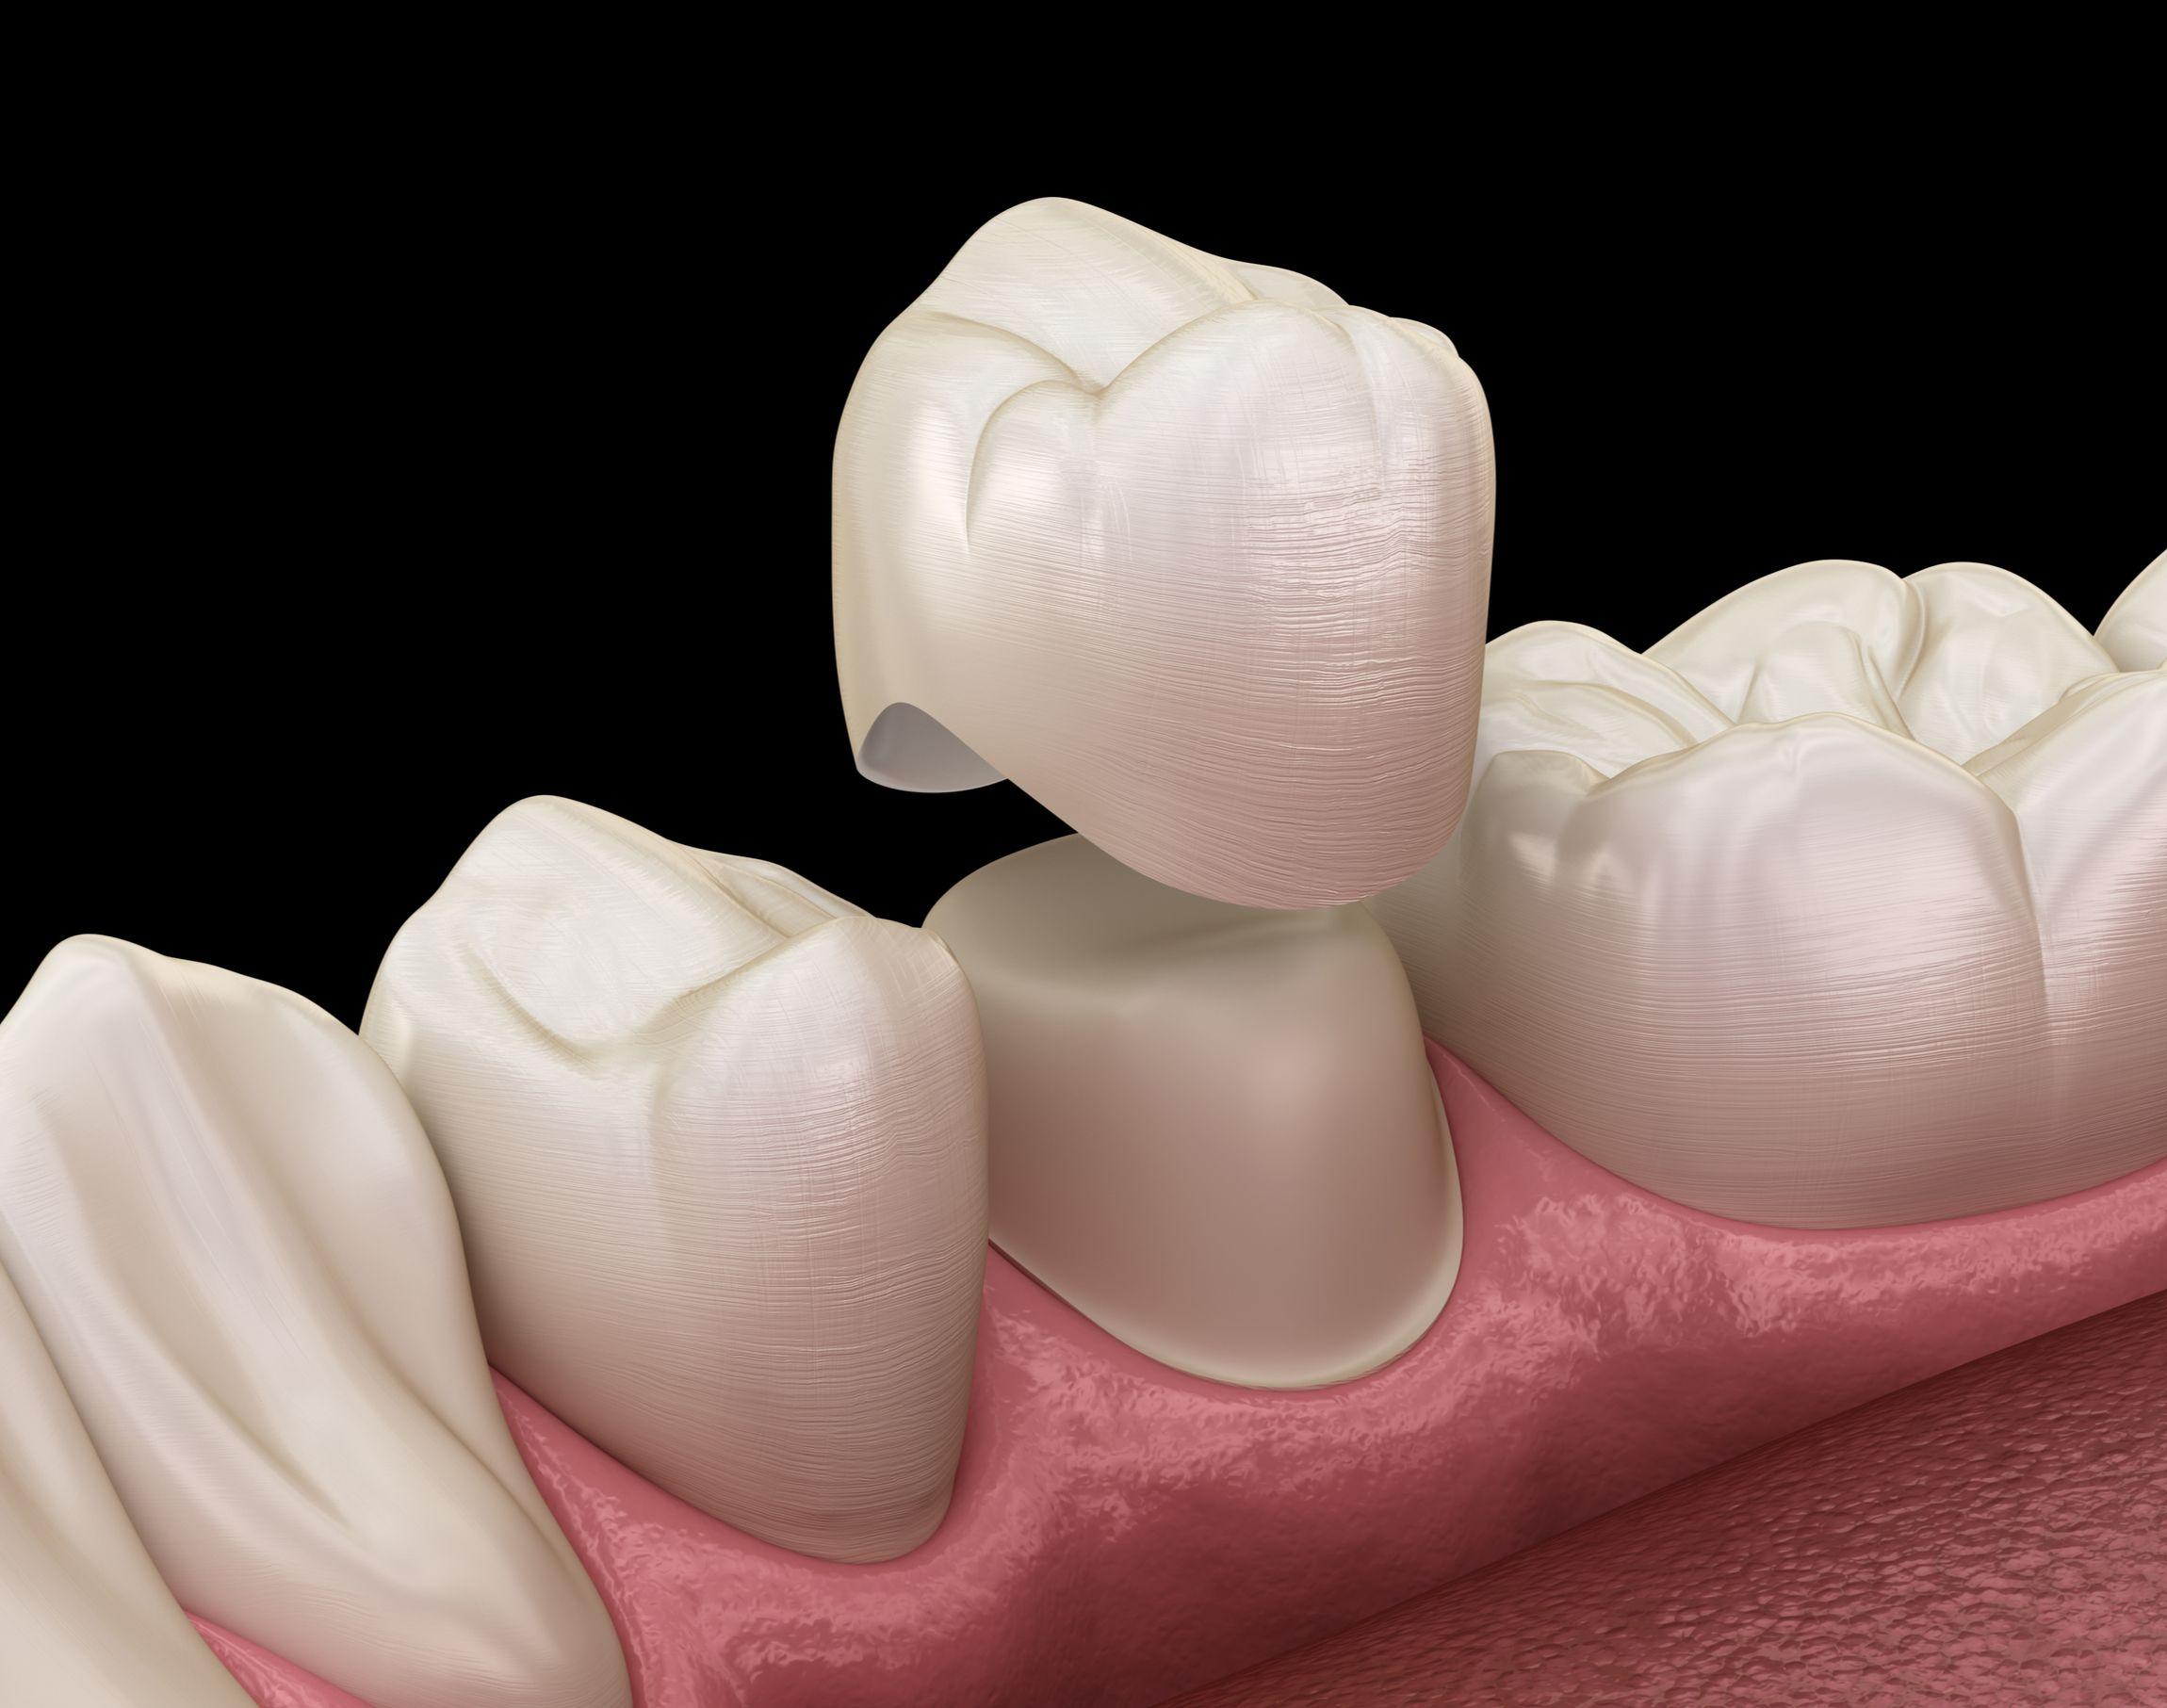 Dental Crown Dentist In Chicopee, MA